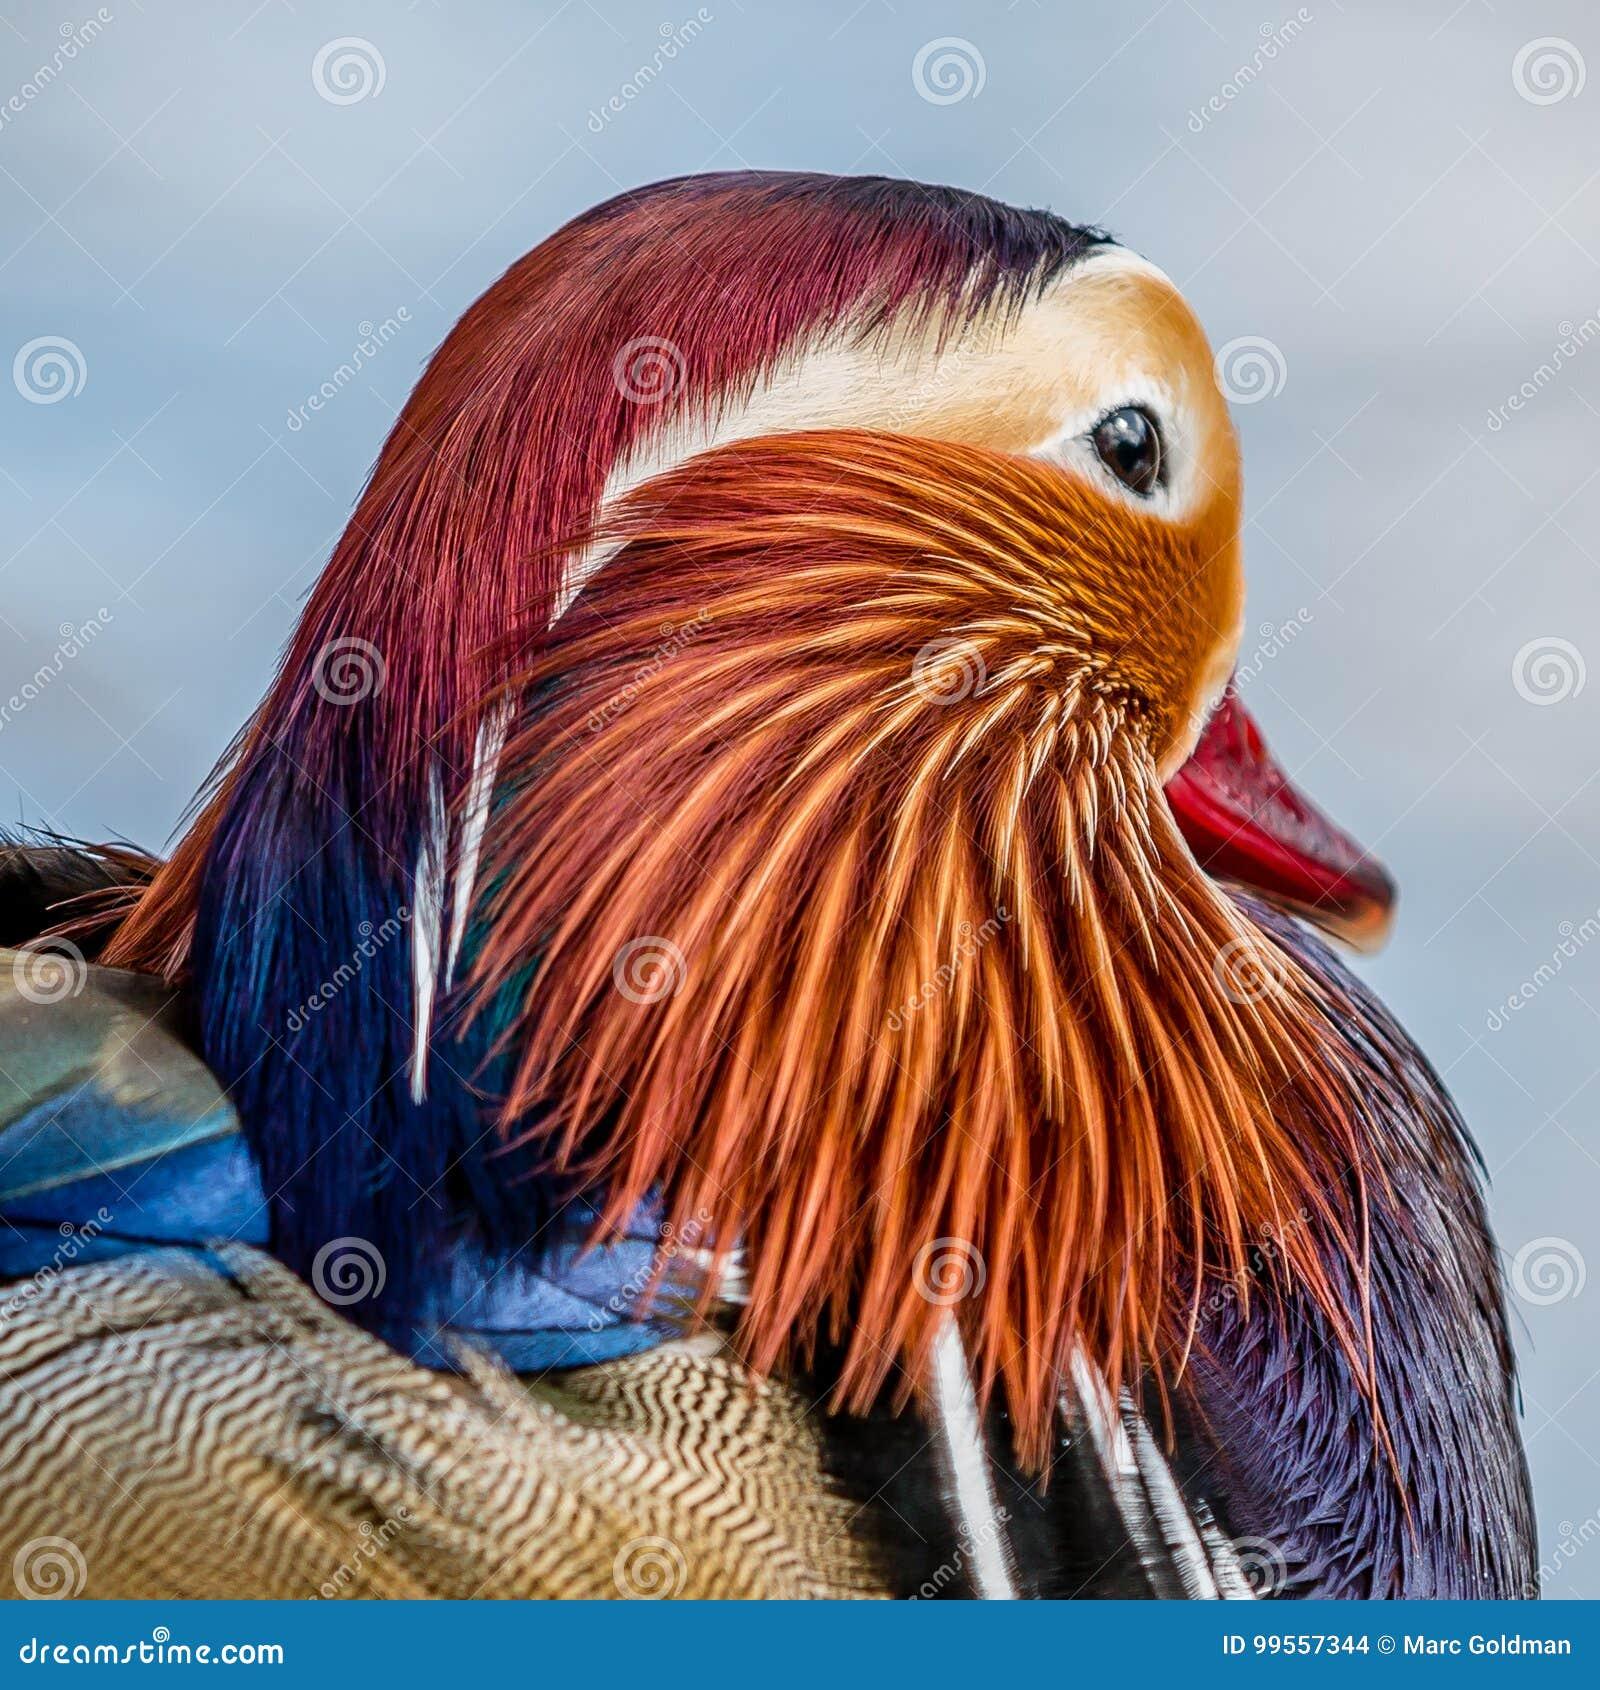 La cabeza de un pato de mandarín